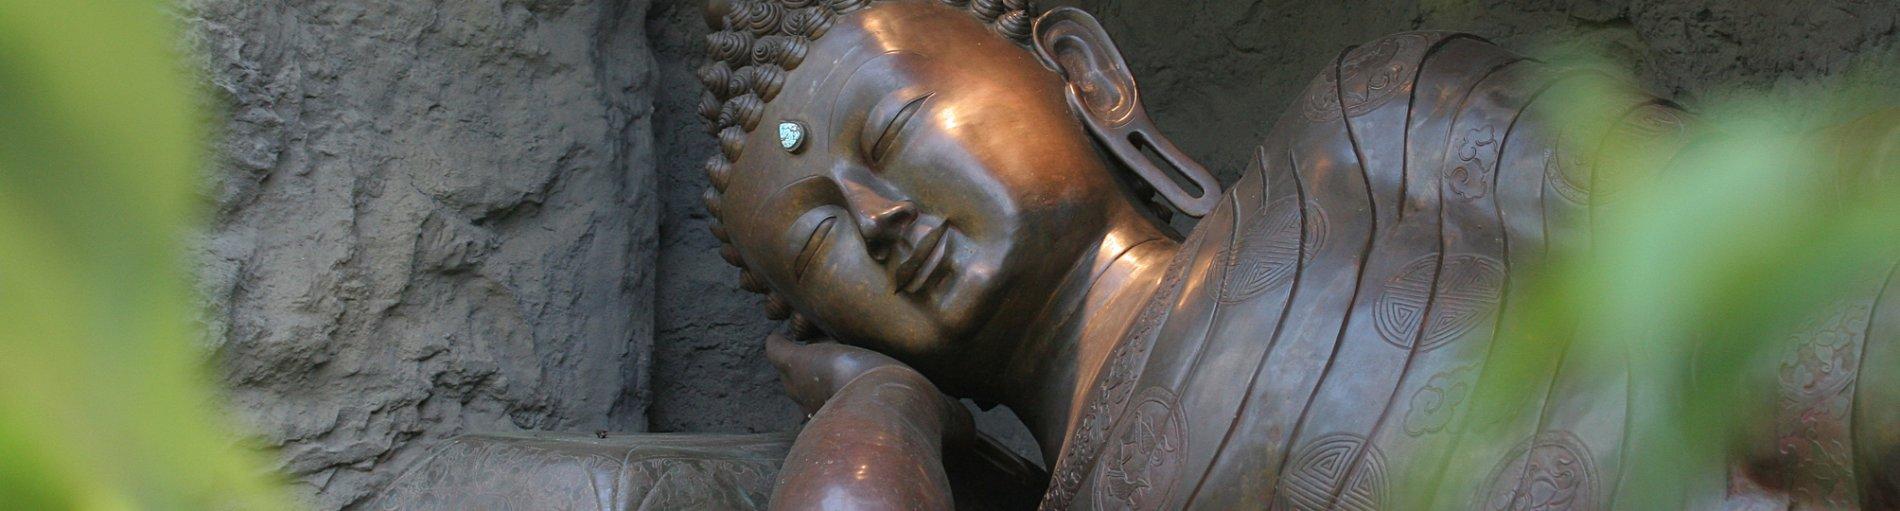 Eine große Himalaya-Buddah Statue im Botanika Garten.